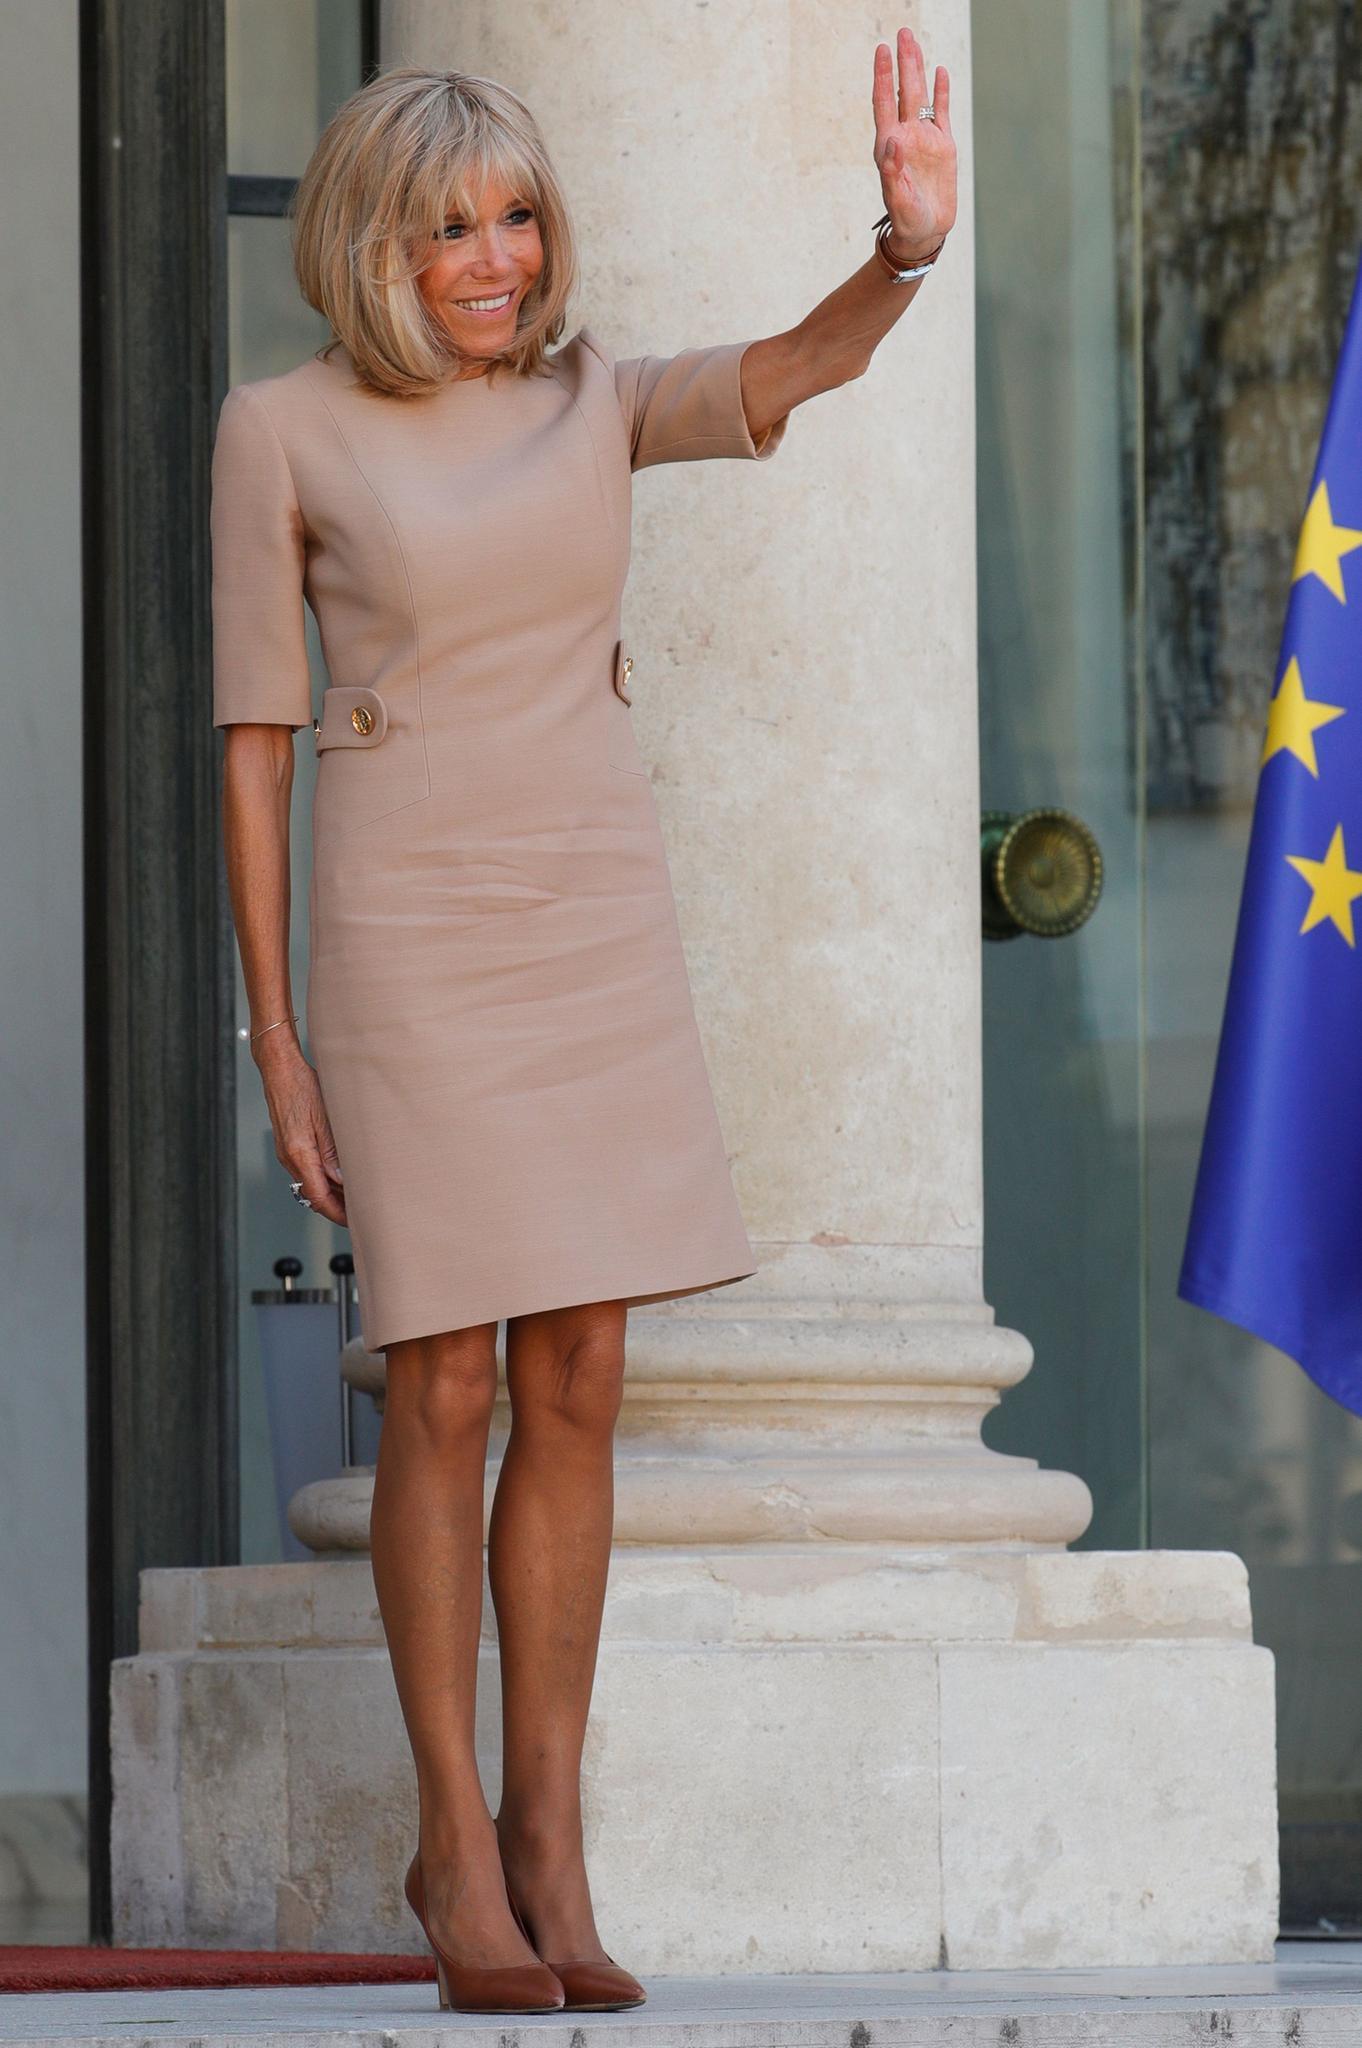 Brigitte Macron: Brigitte Macron im rosa Kleid